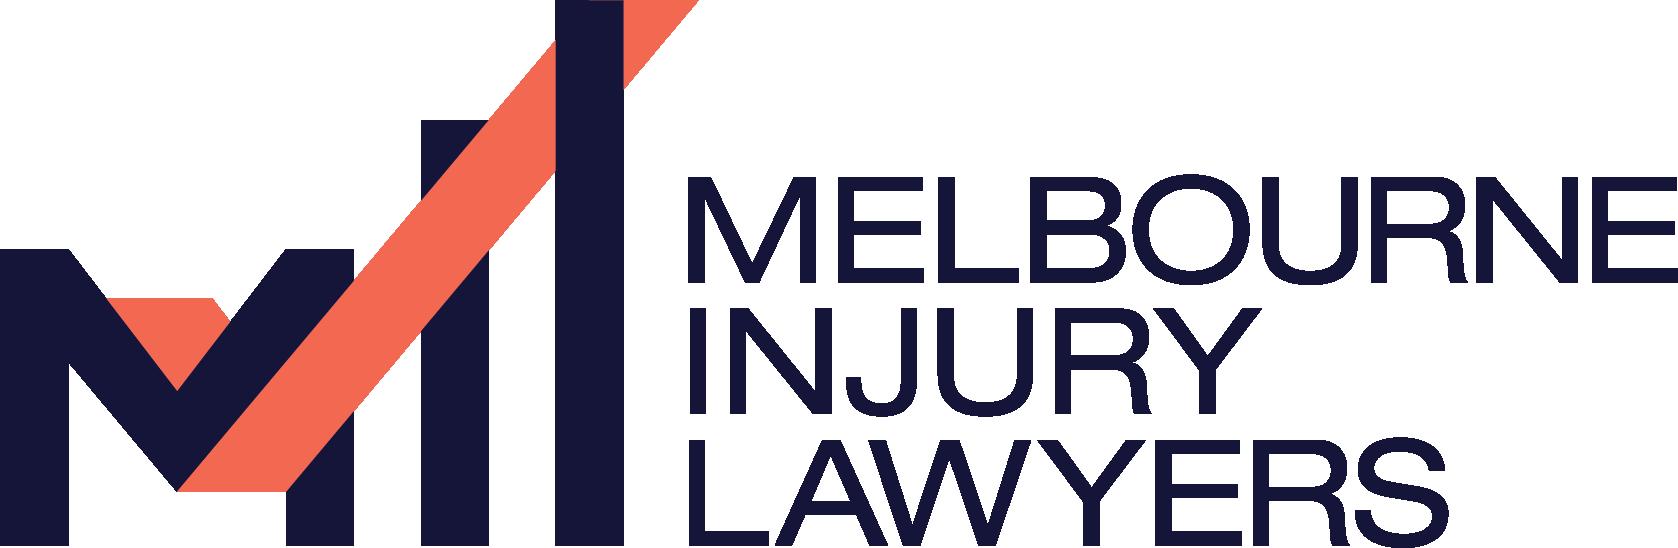 MIL_0001 Branding Final Logo Suite-01.png